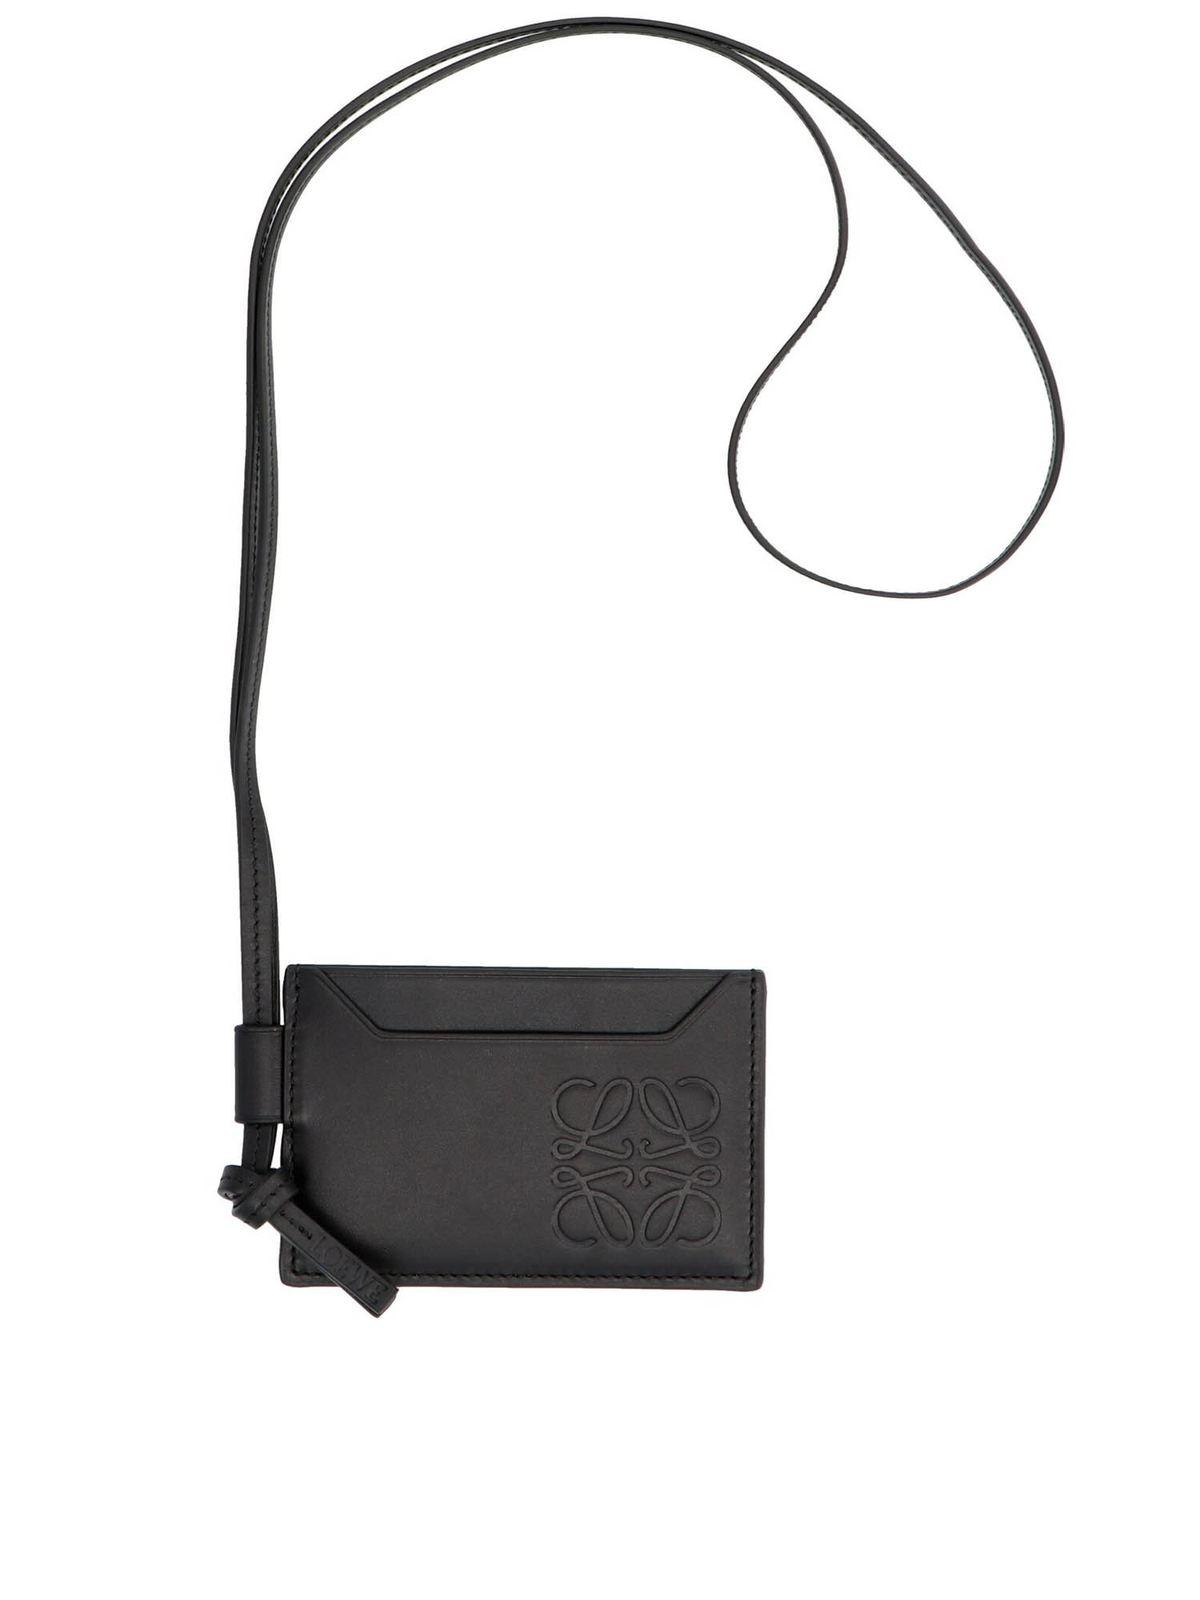 Loewe LACE CARD HOLDER IN BLACK